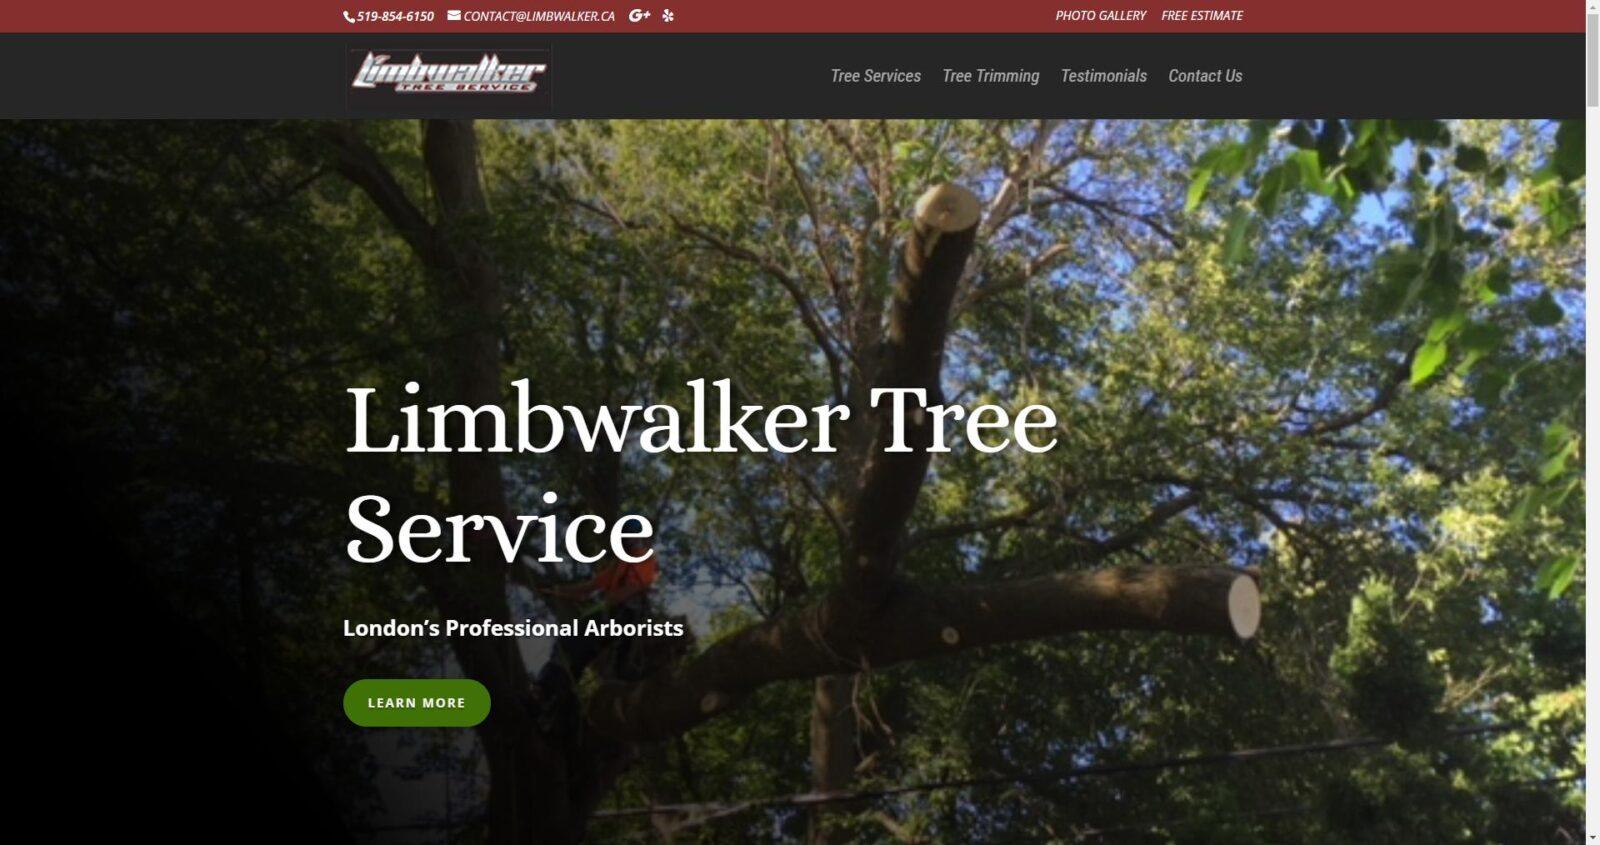 Limbwalker Tree Service London's Professional Arborists